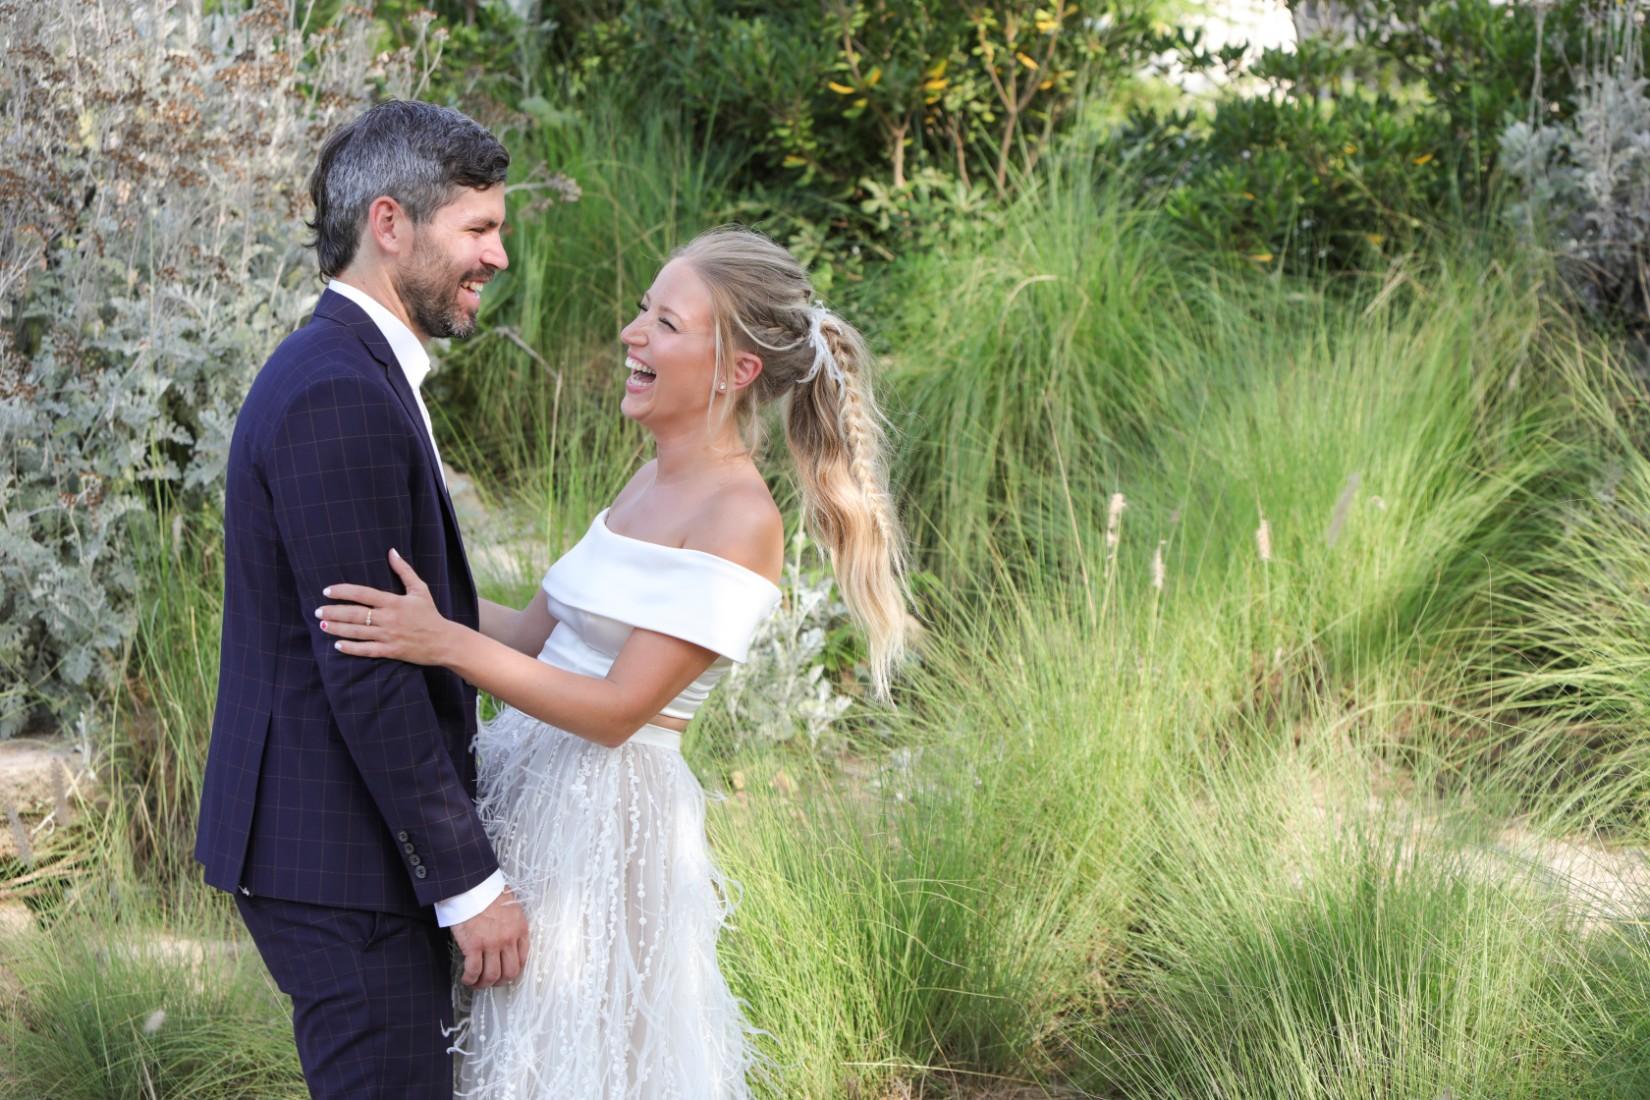 good vibes only: החתונה של הלה ושגיא